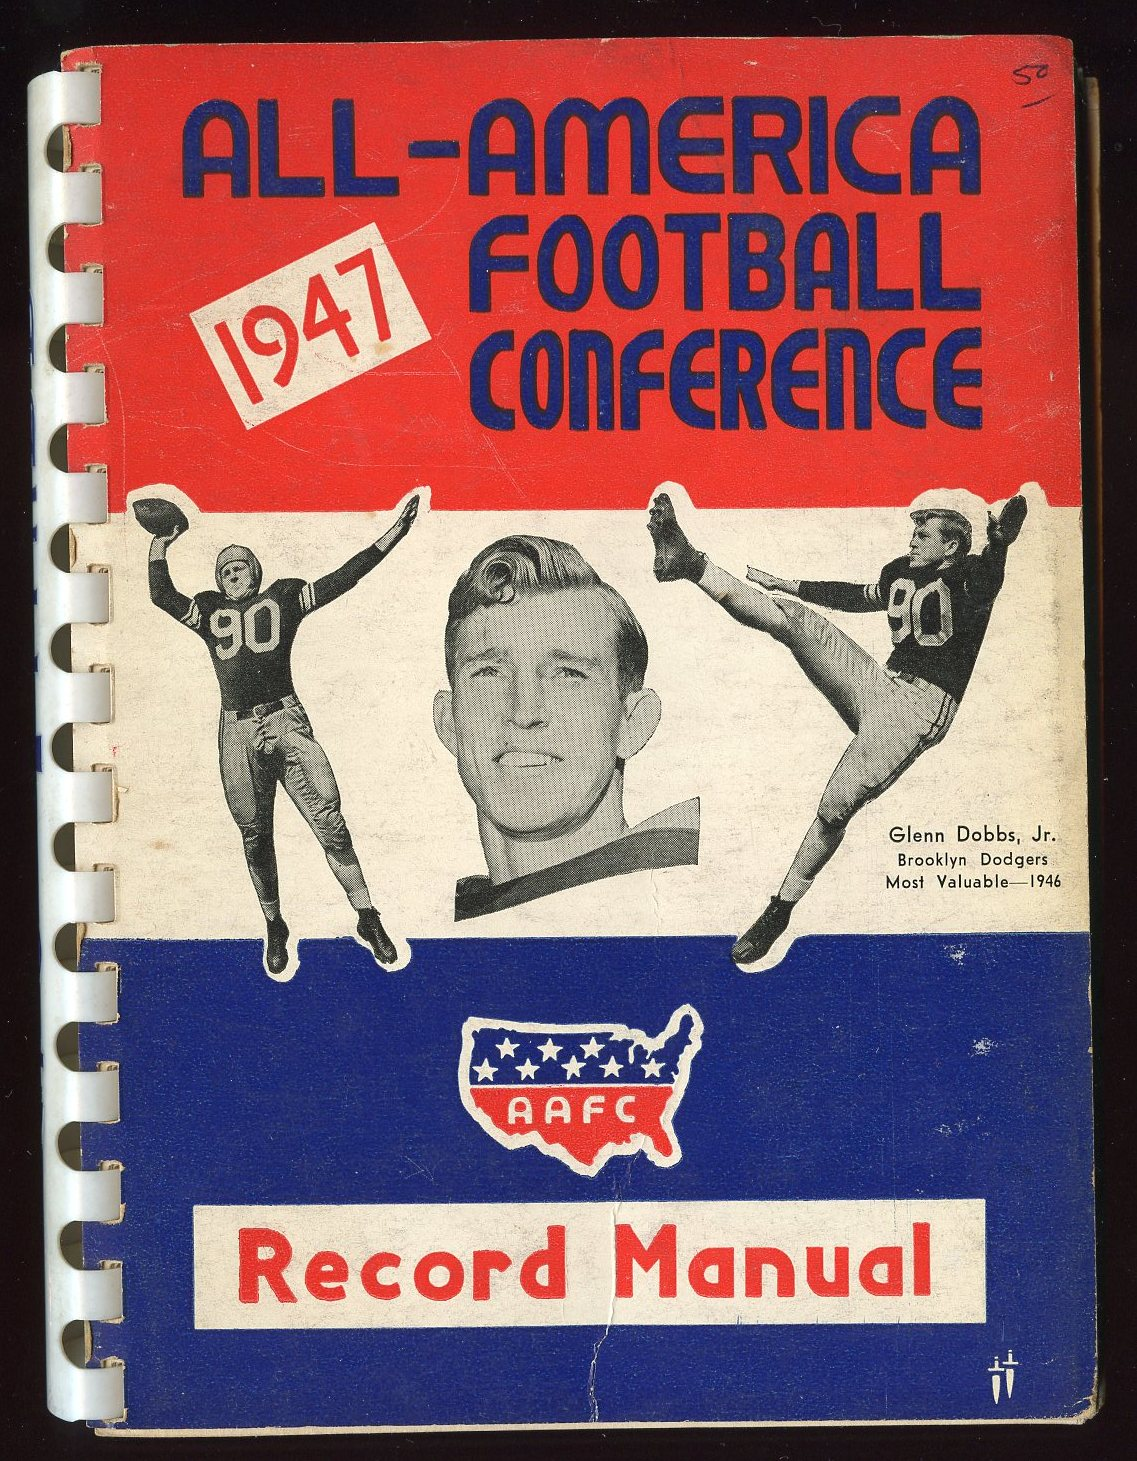 msb 5 1947 AAFC guide.jpg